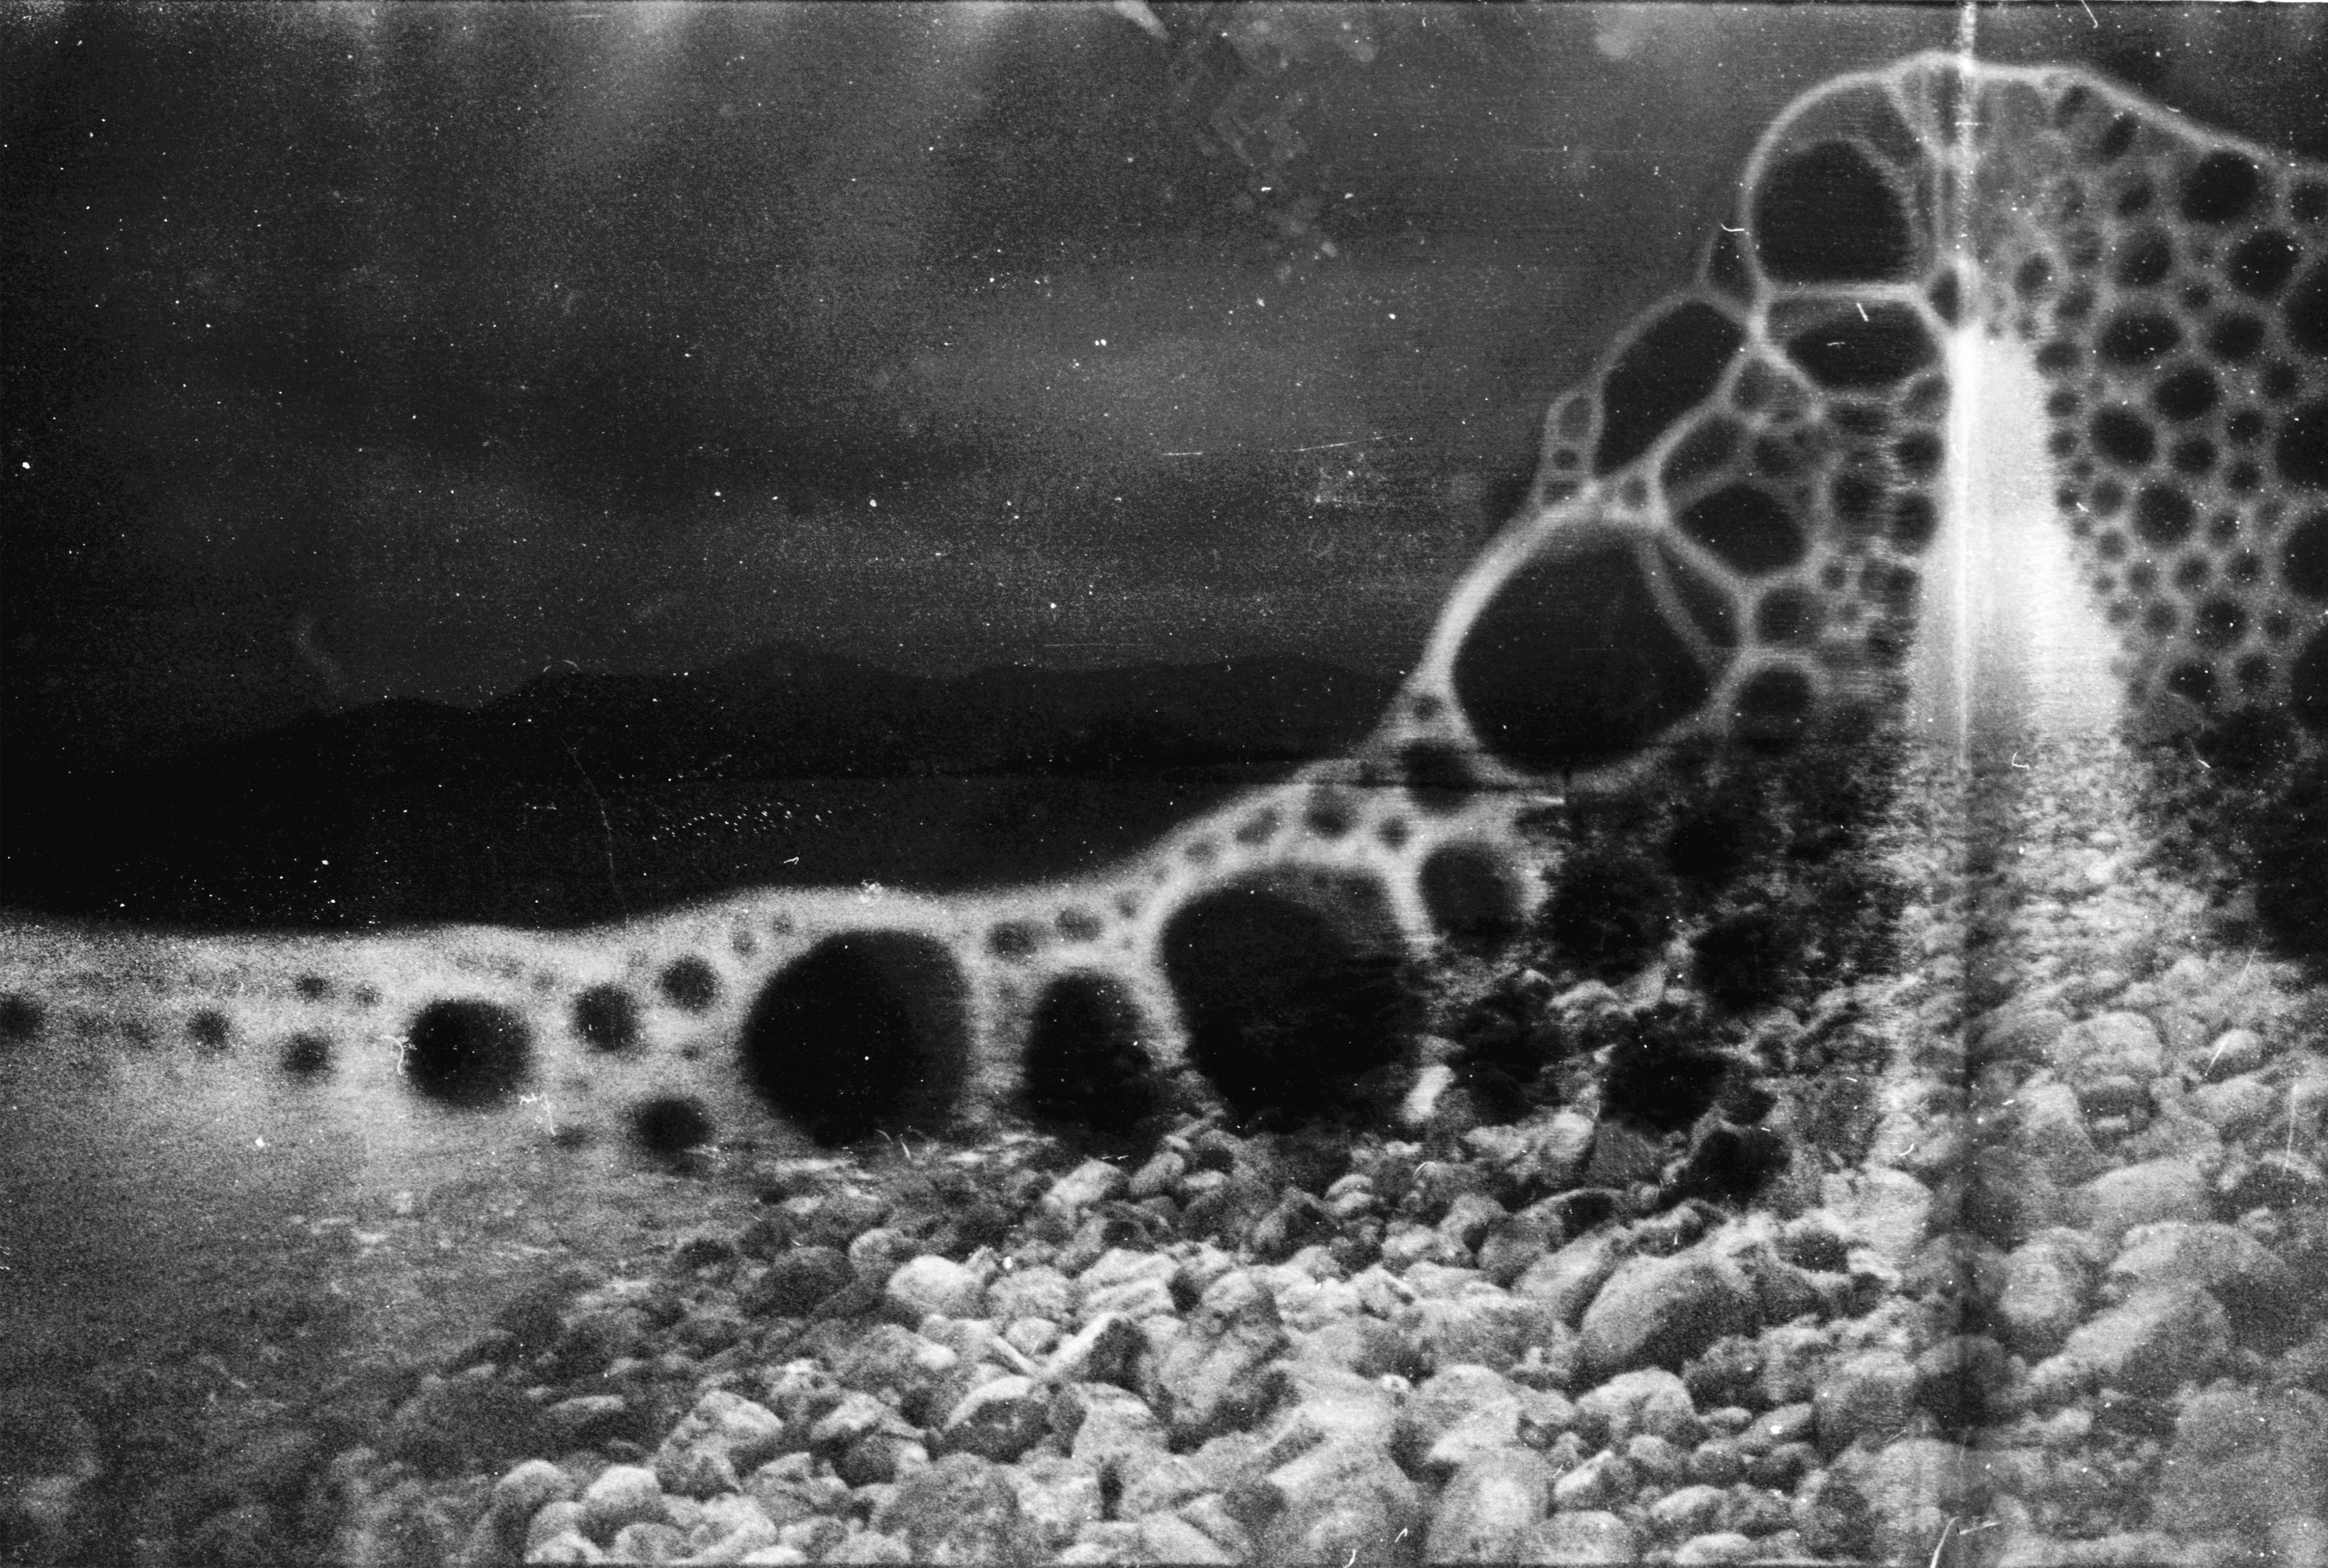 Ana Peixet en Contrafotografía - Esmús